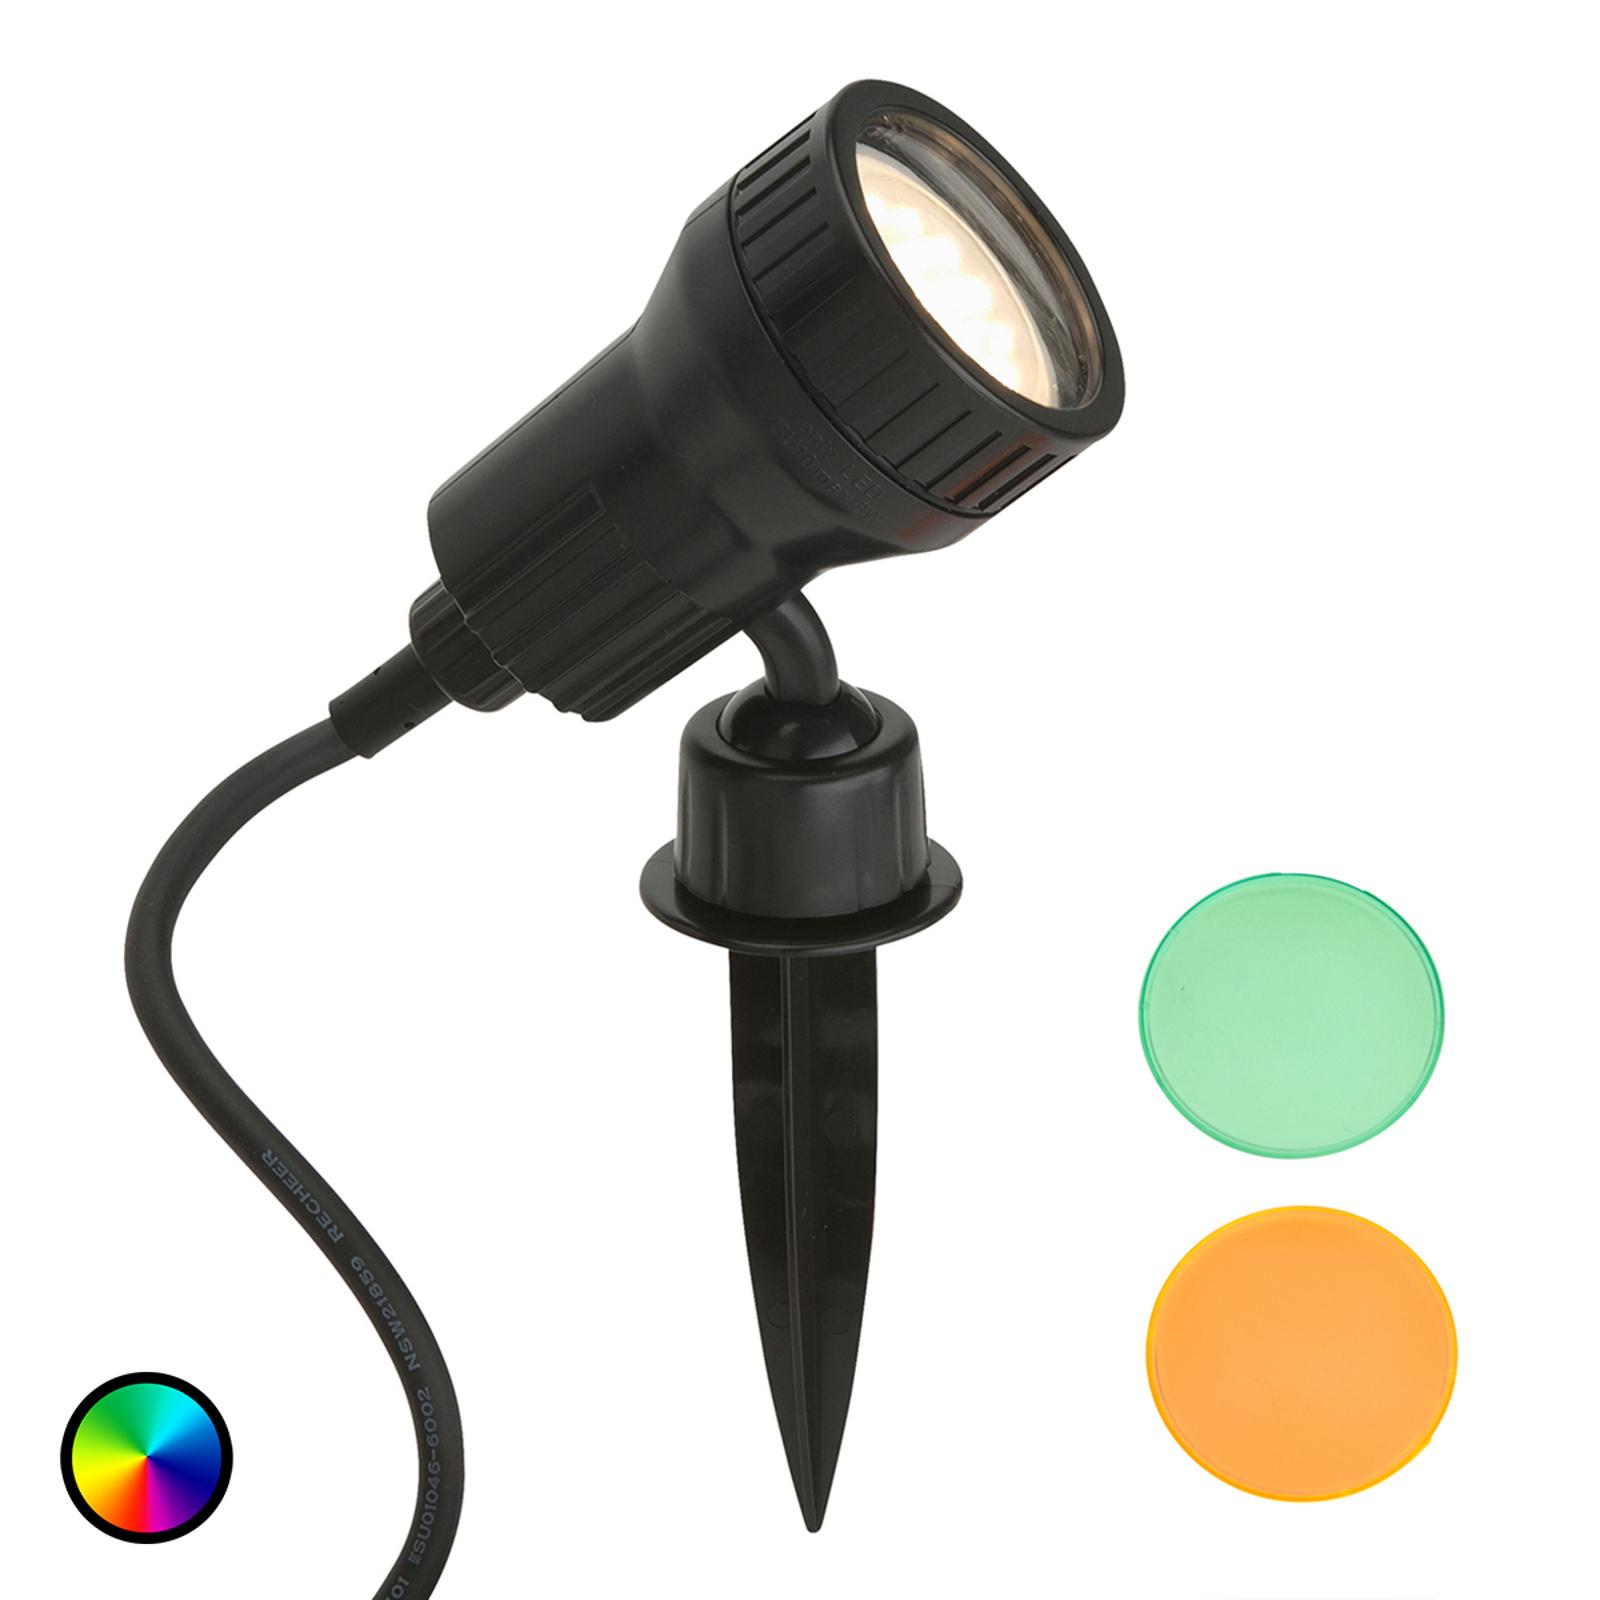 LED-Erdspießstrahler Terra inklusive Farbfilter